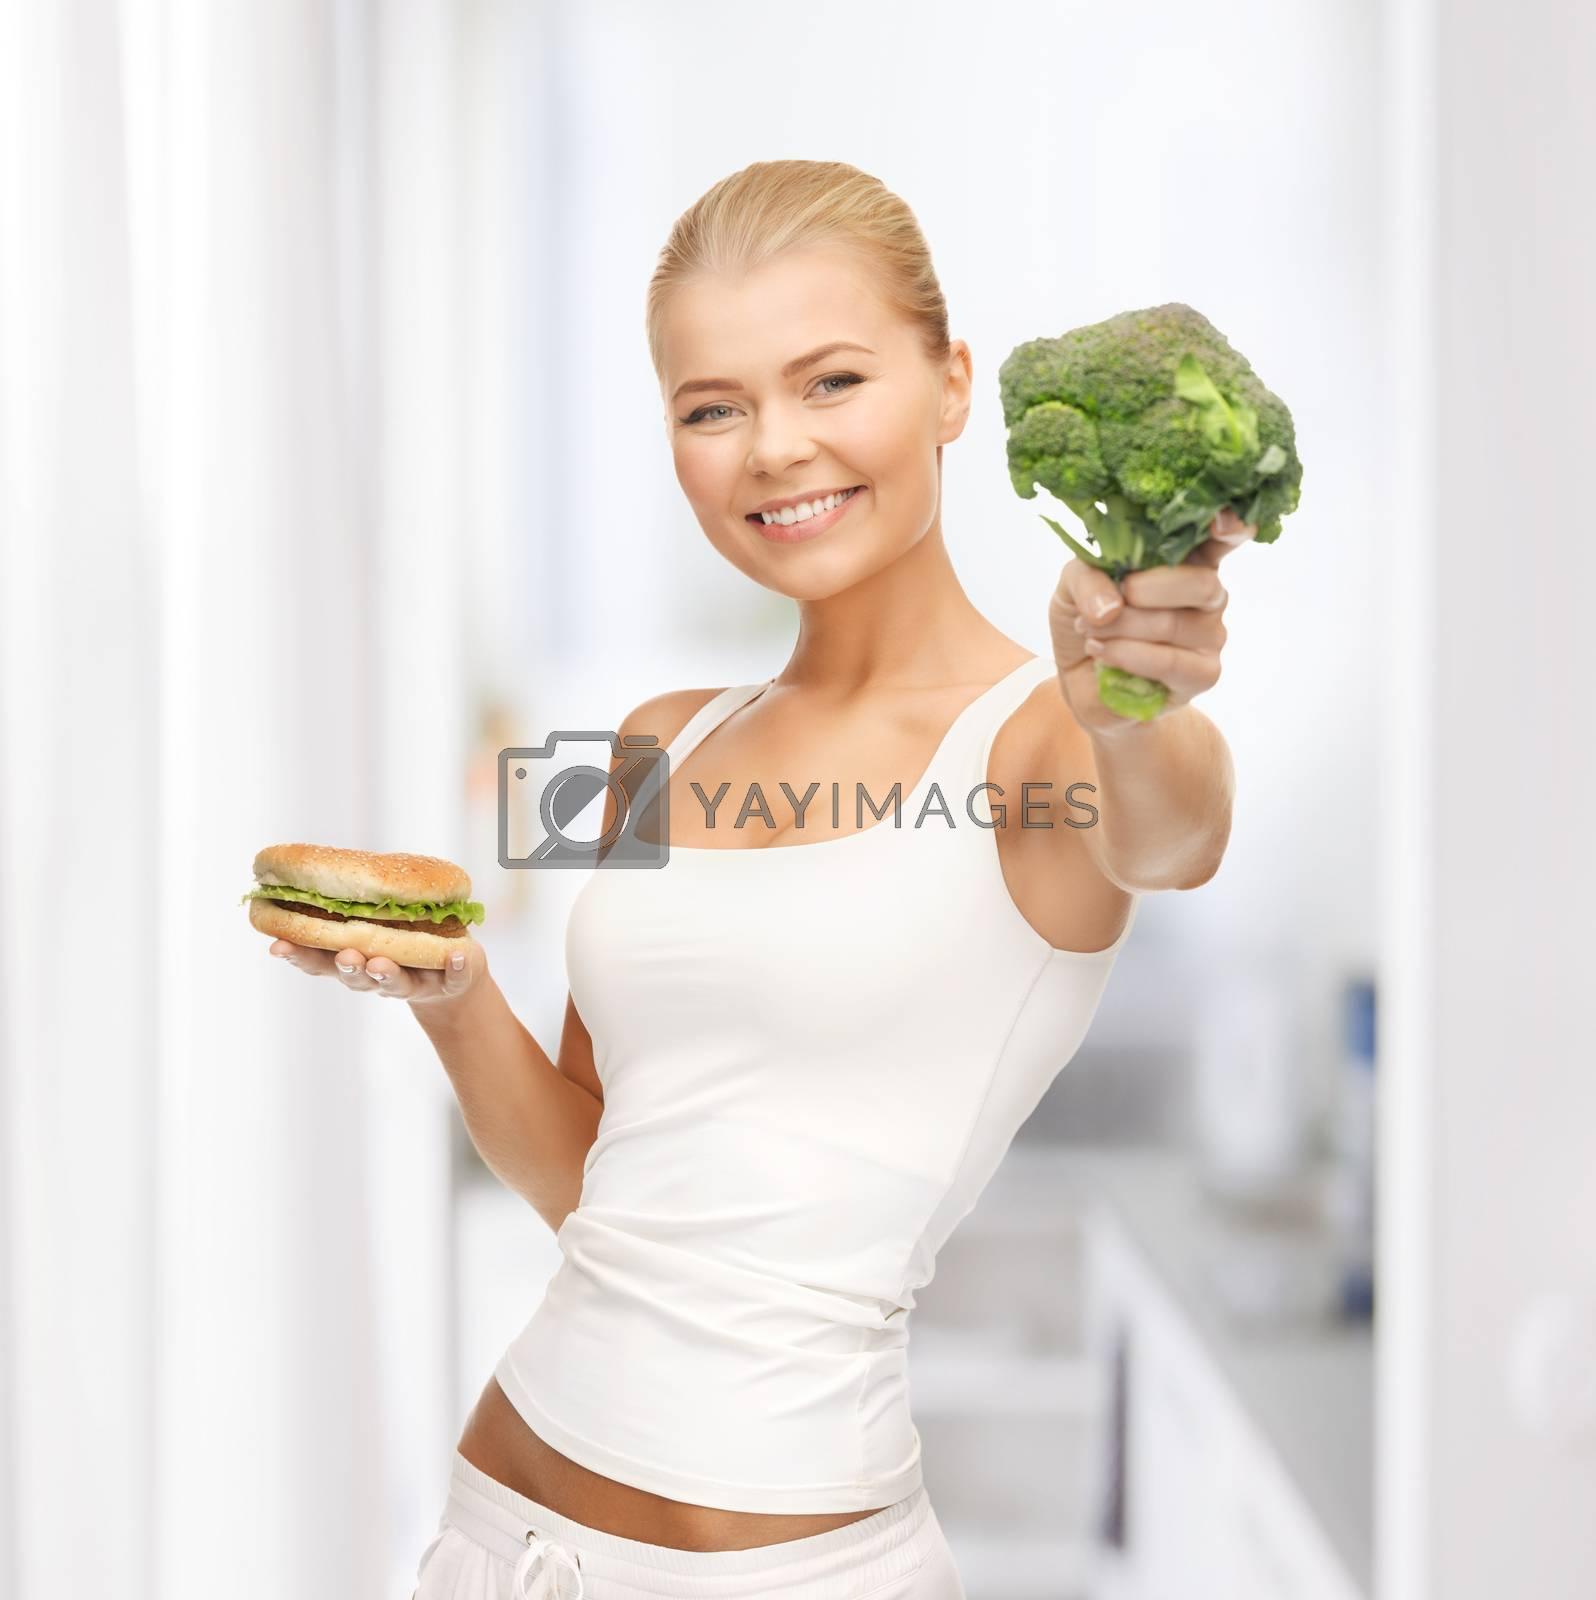 woman with broccoli and hamburger by dolgachov